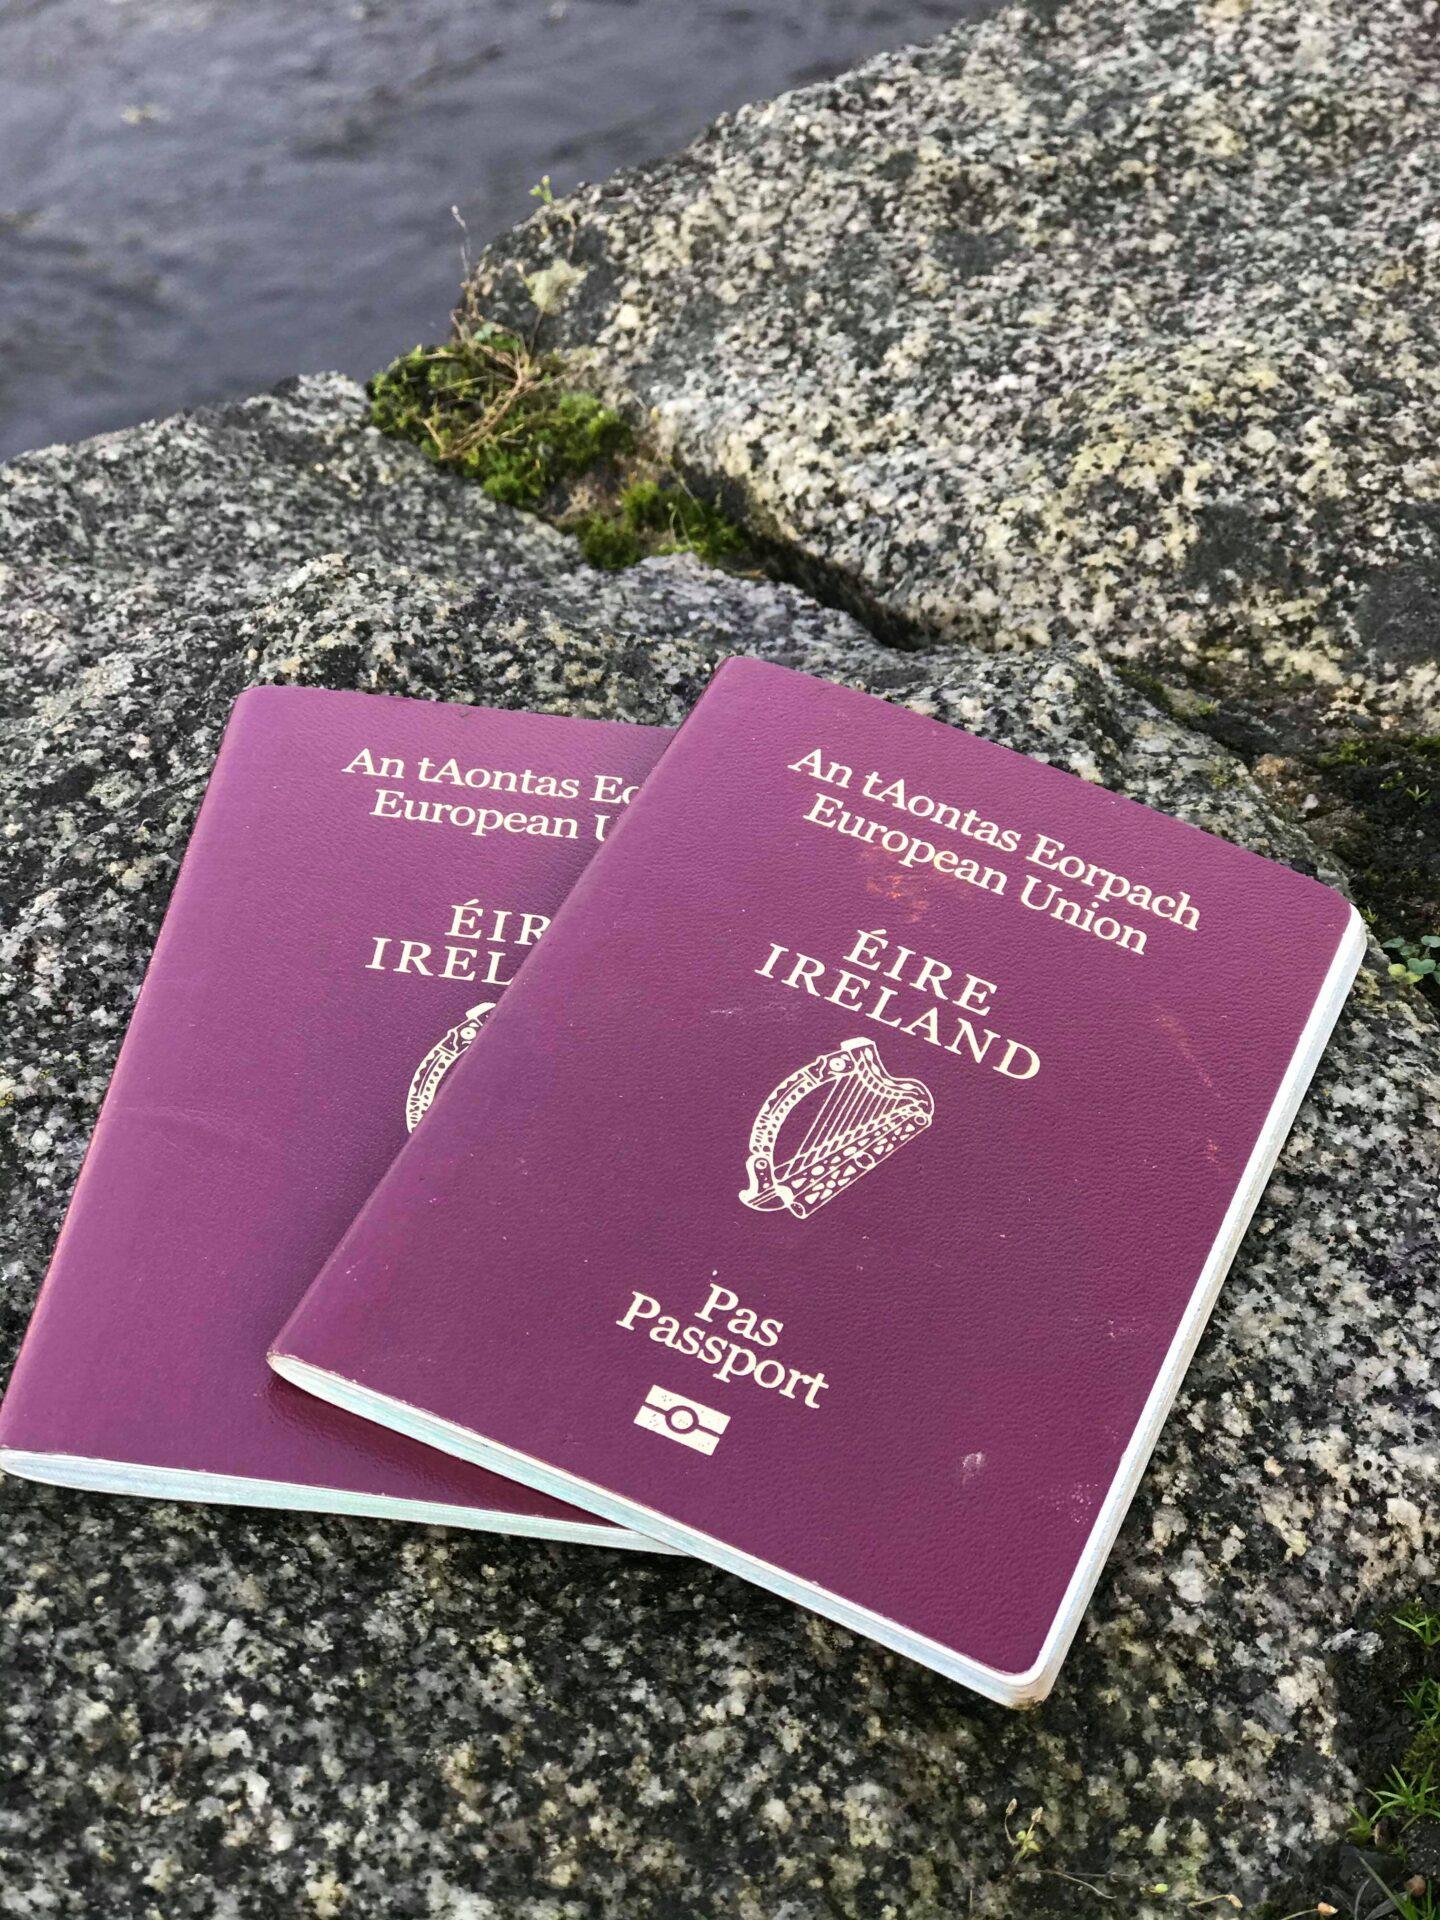 Discussion: Irish citizens and the EU Settlement Scheme